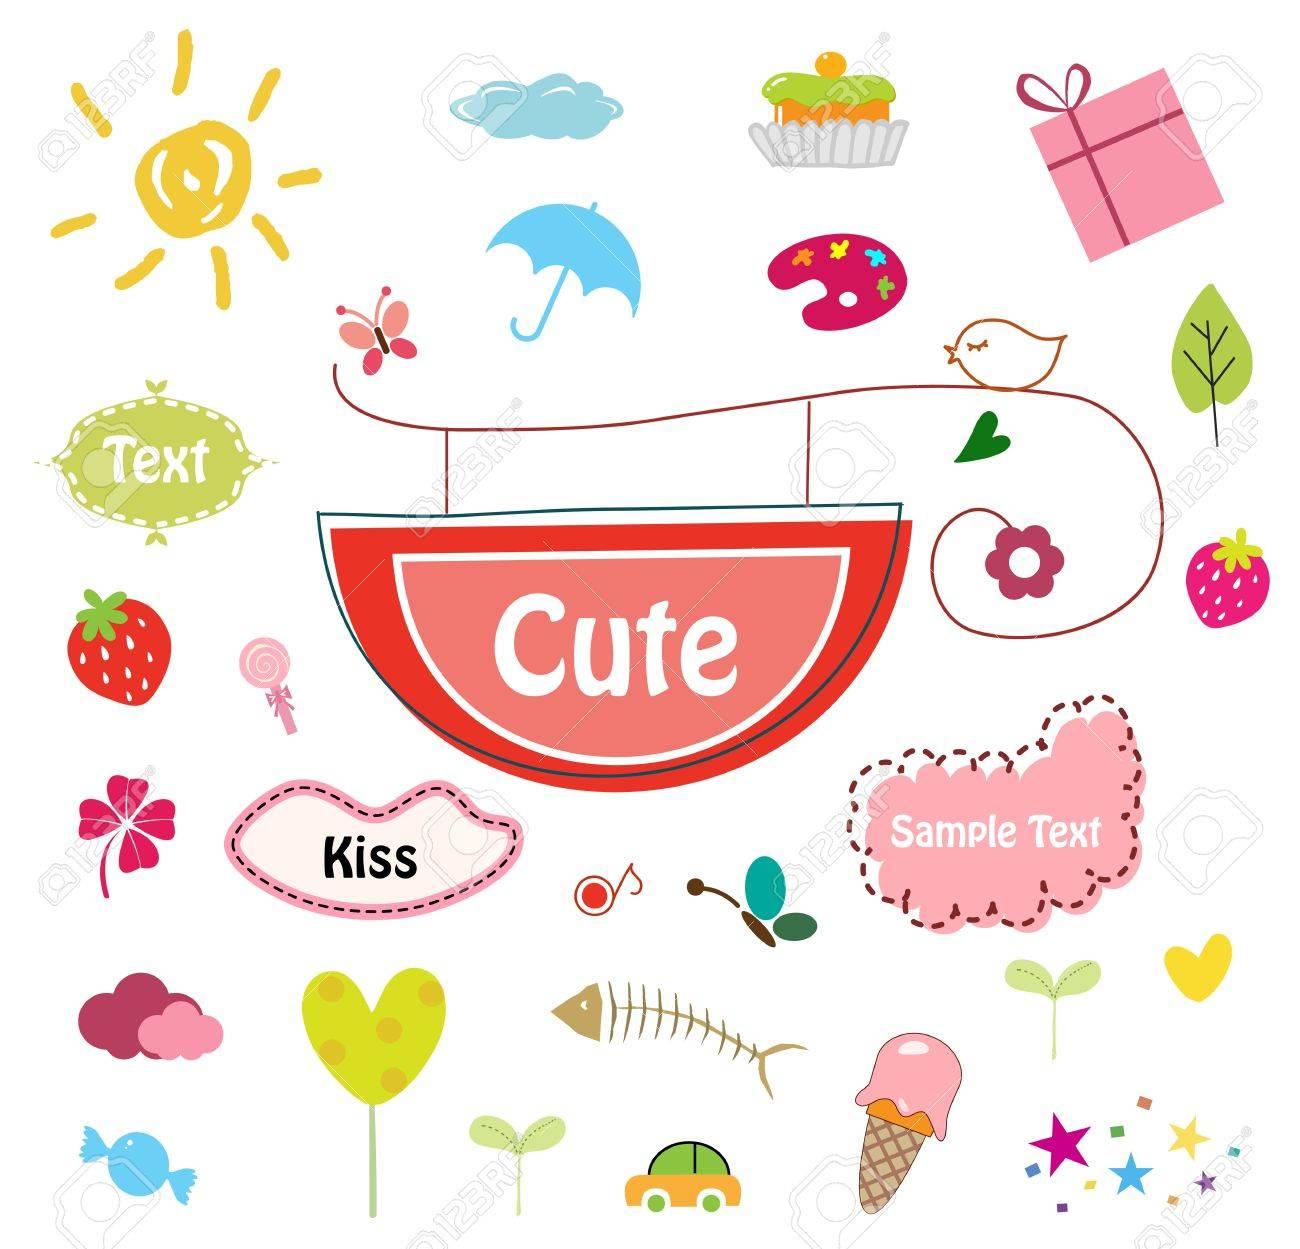 Designed Cute Elements -   Illustration Stock Vector - 8640544